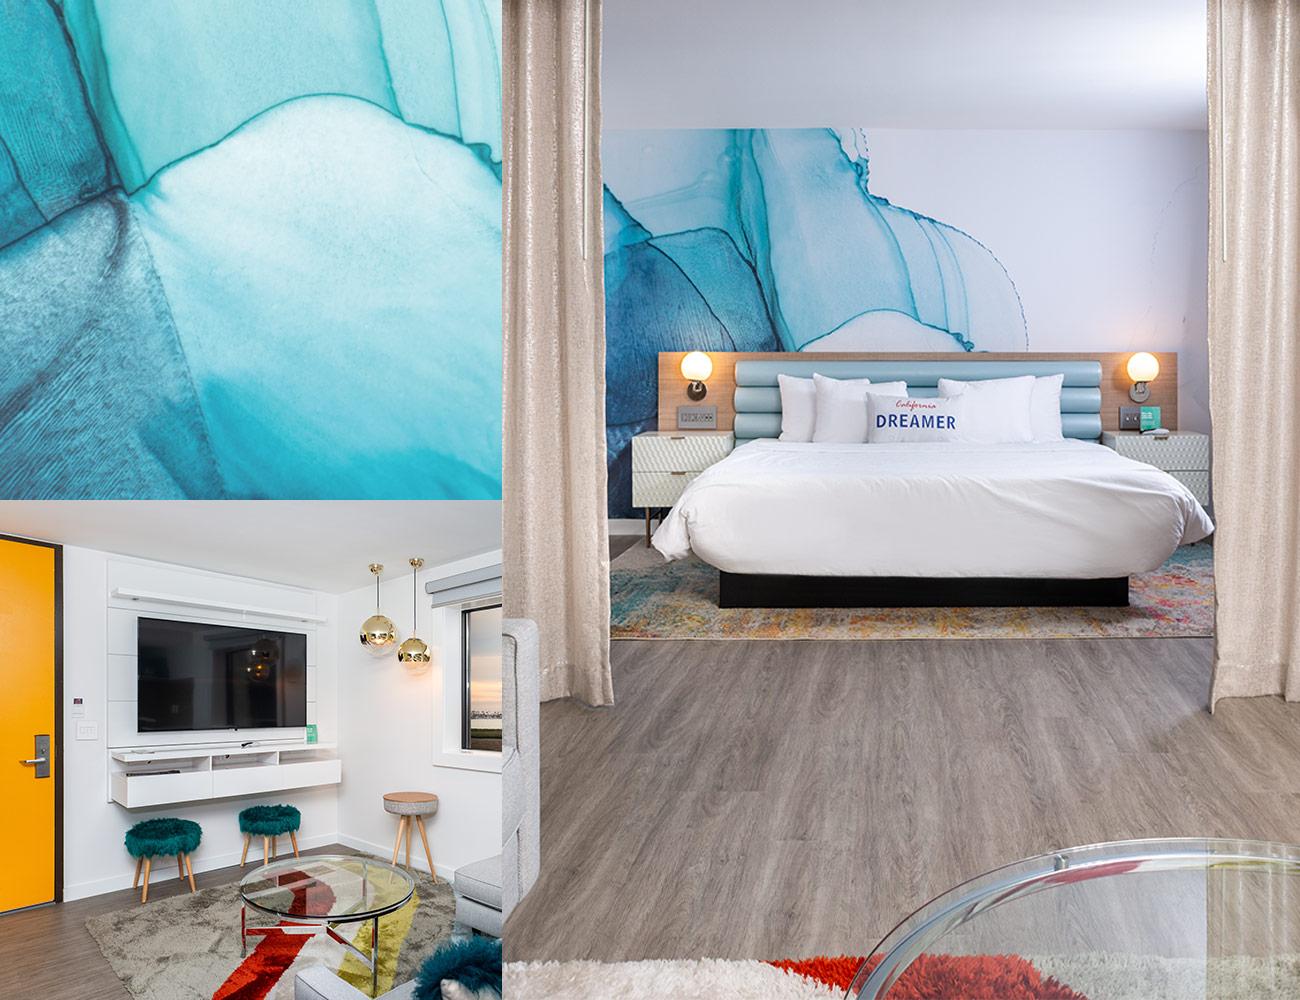 Rambler suites interior views of bed and wallpaper backsplash